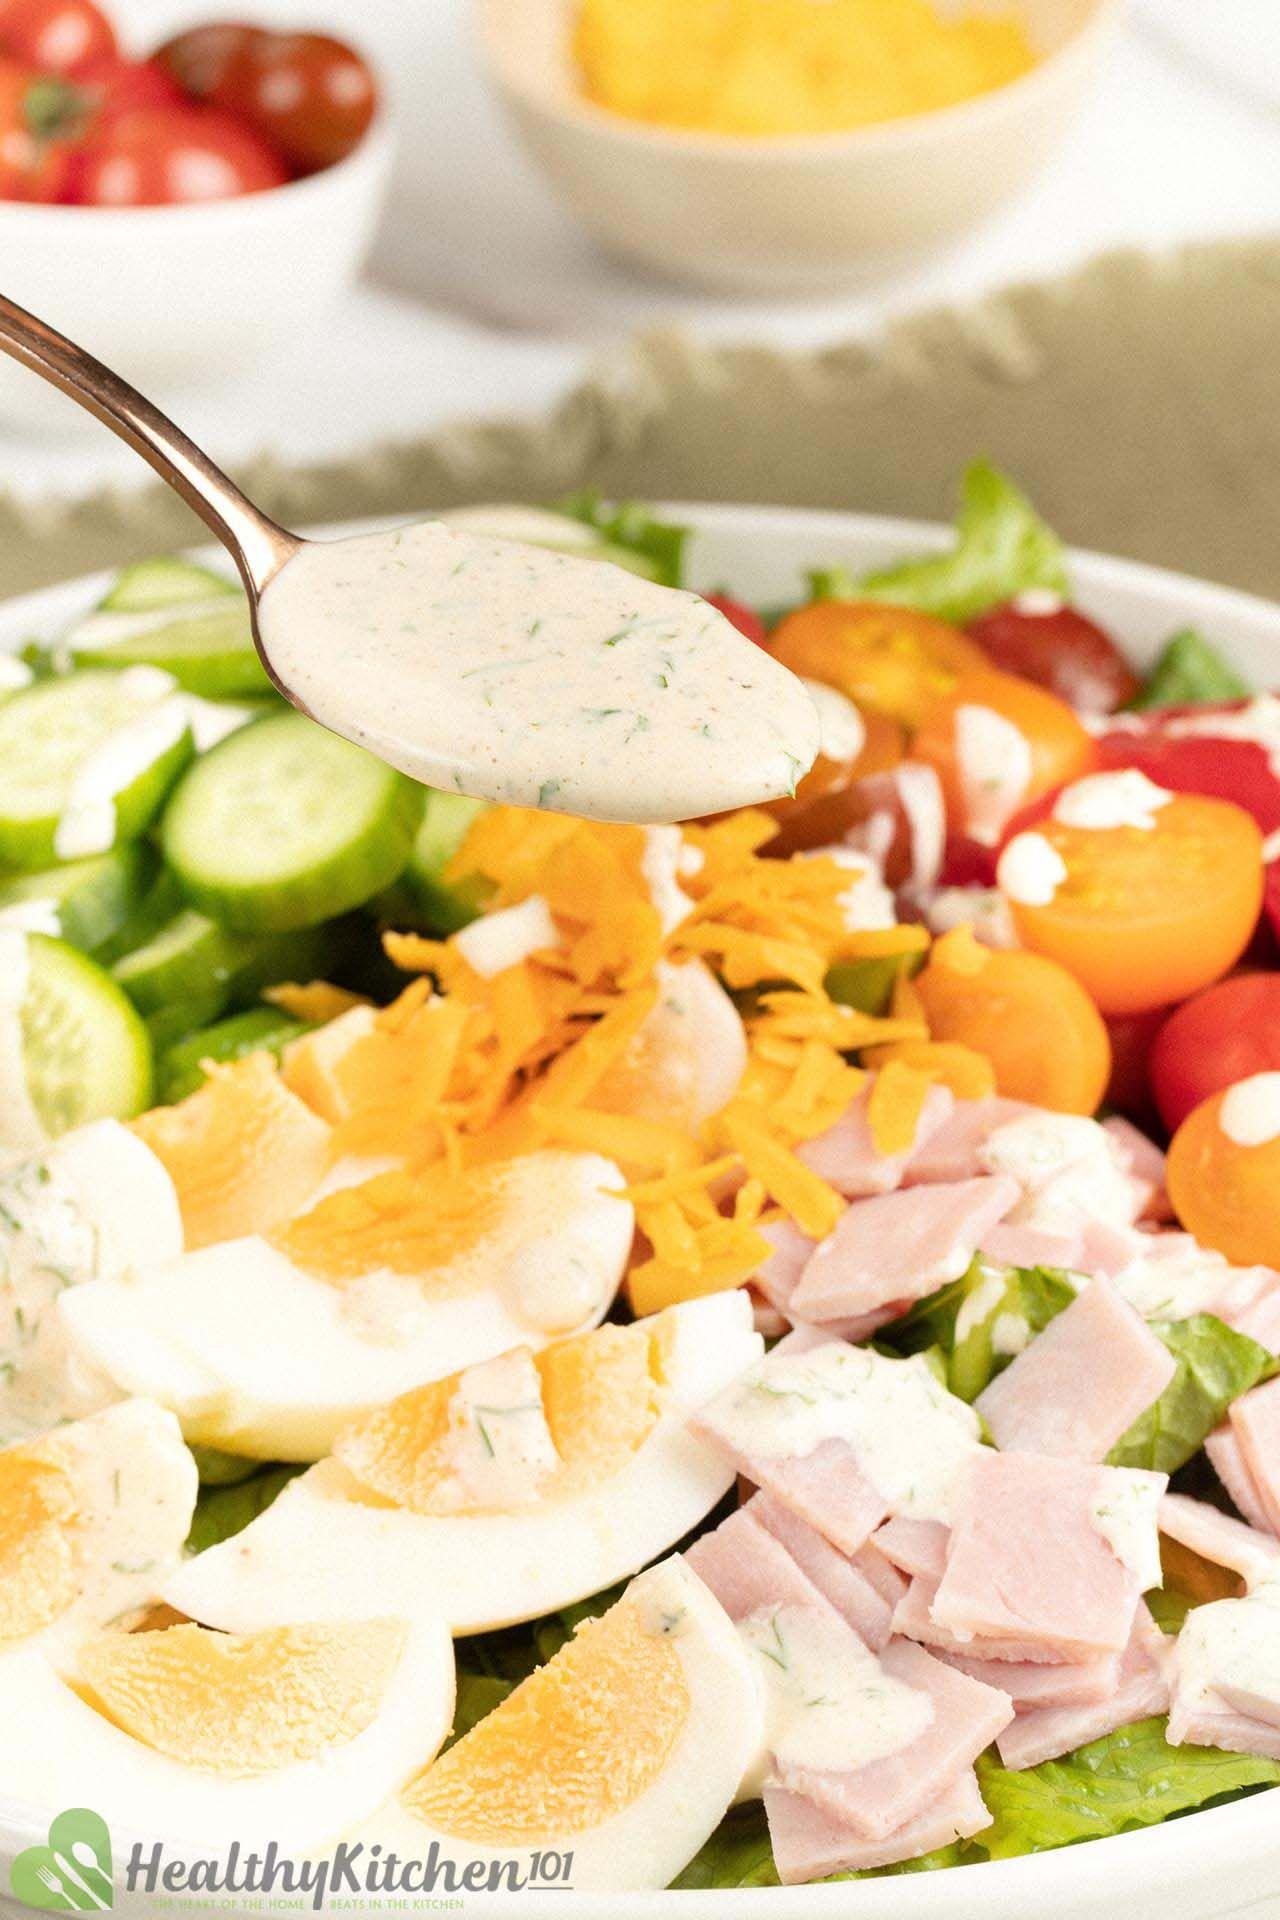 is chef salad healthy